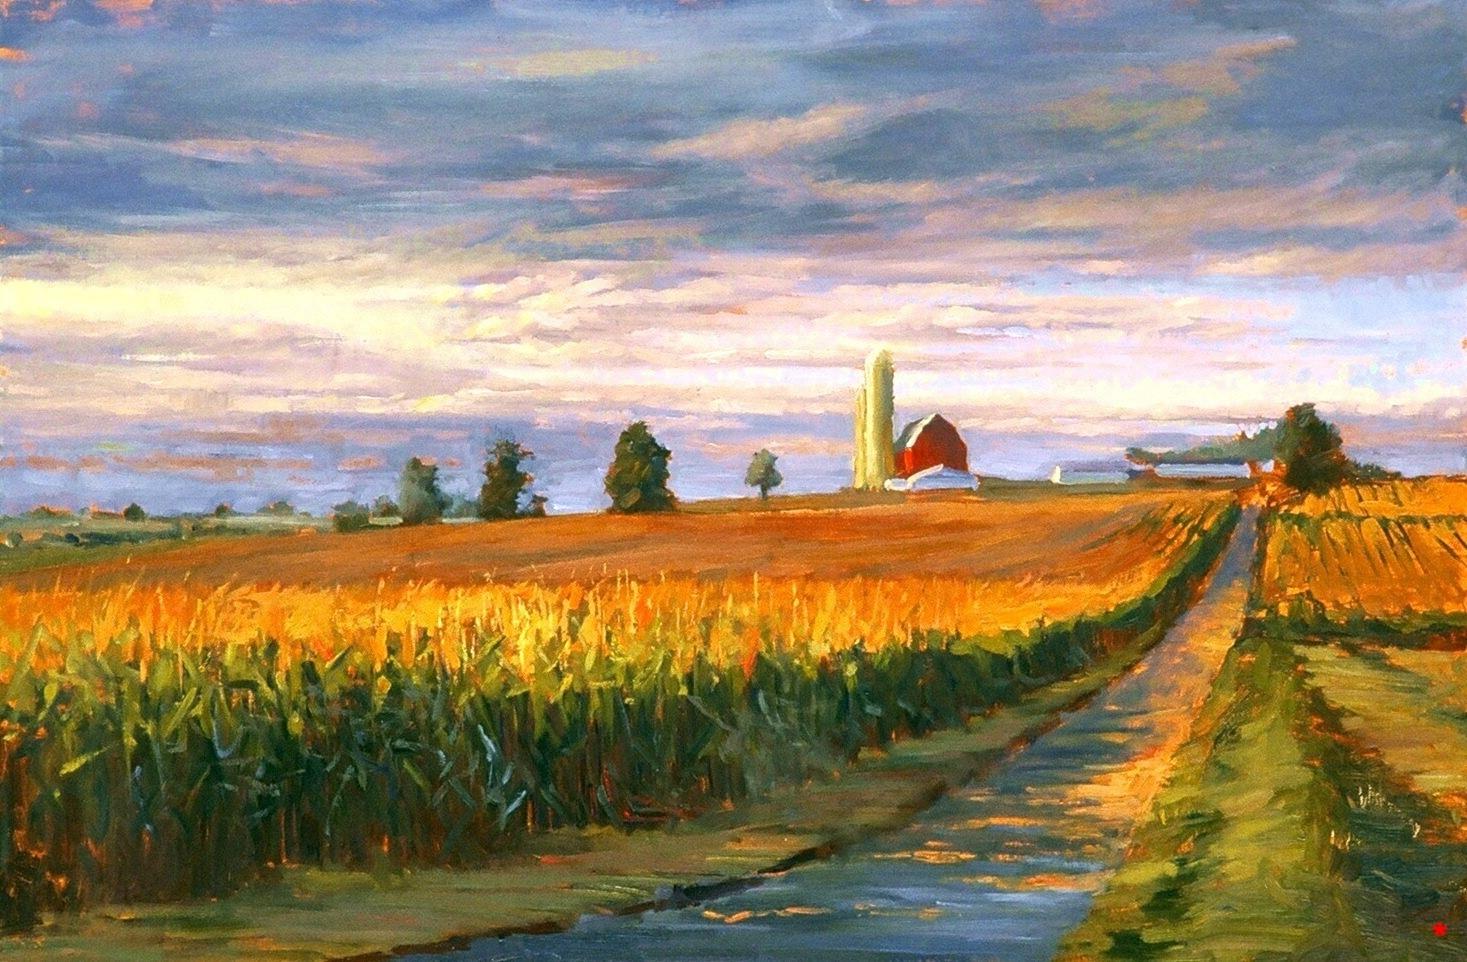 3. Cornfields At Sunset, oil on canvas, 24 x 36.jpg